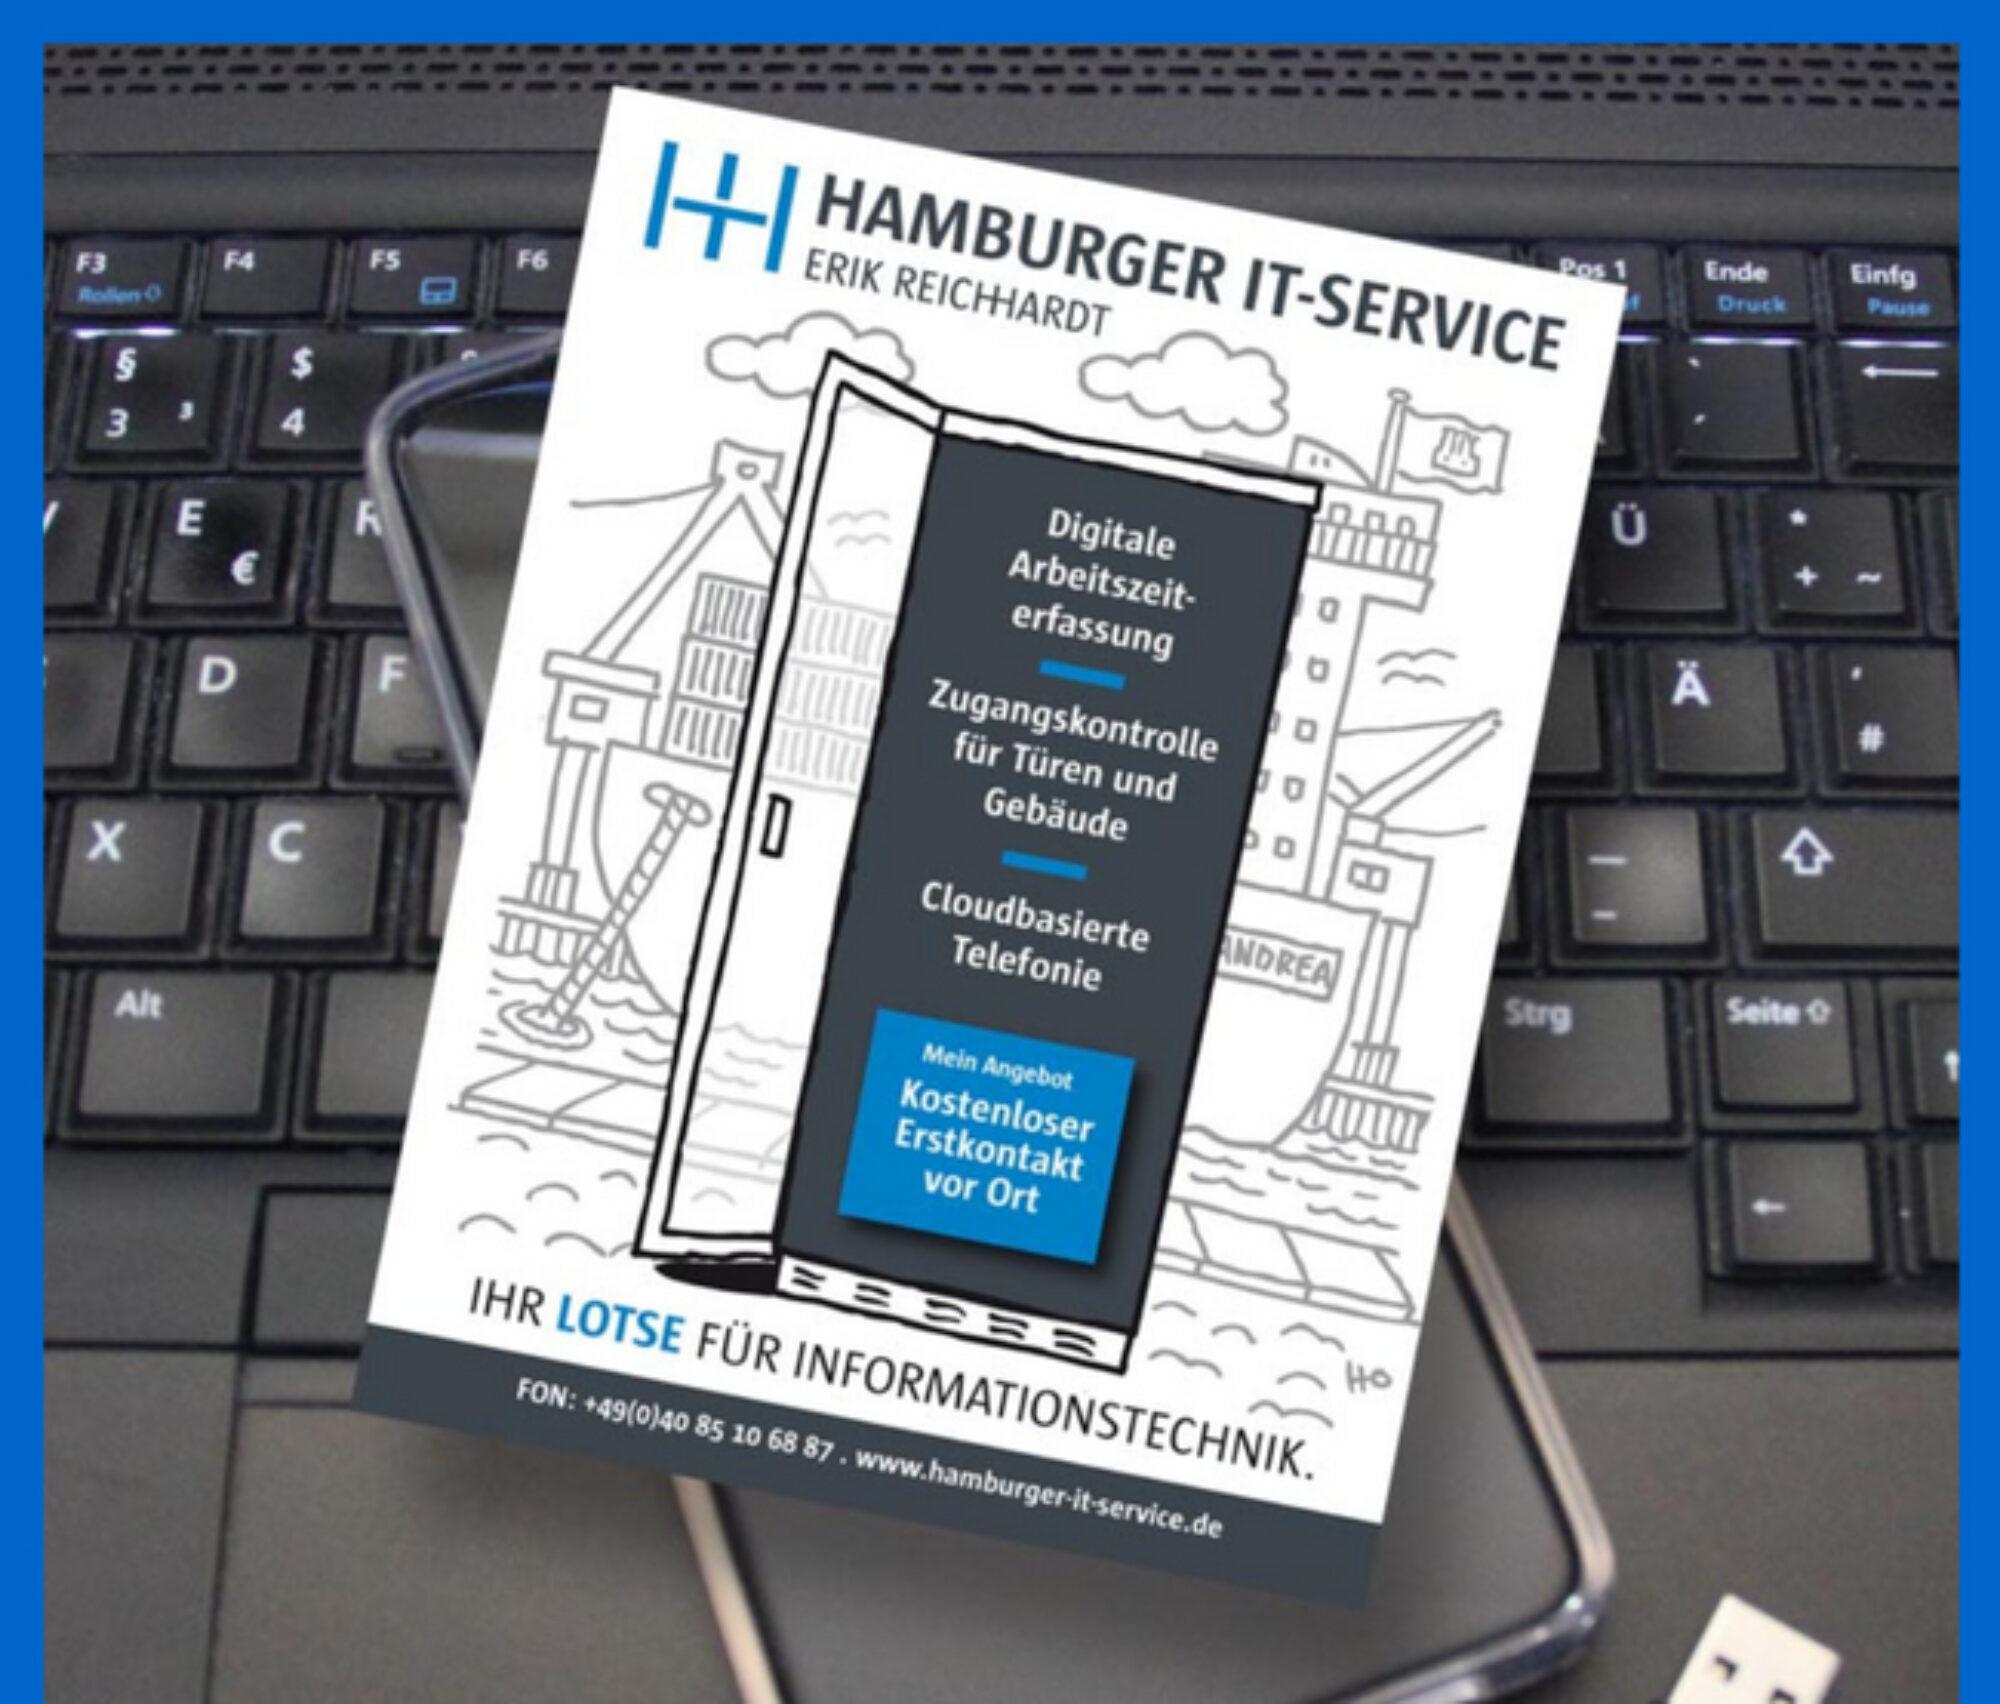 Hamburger-IT-Service